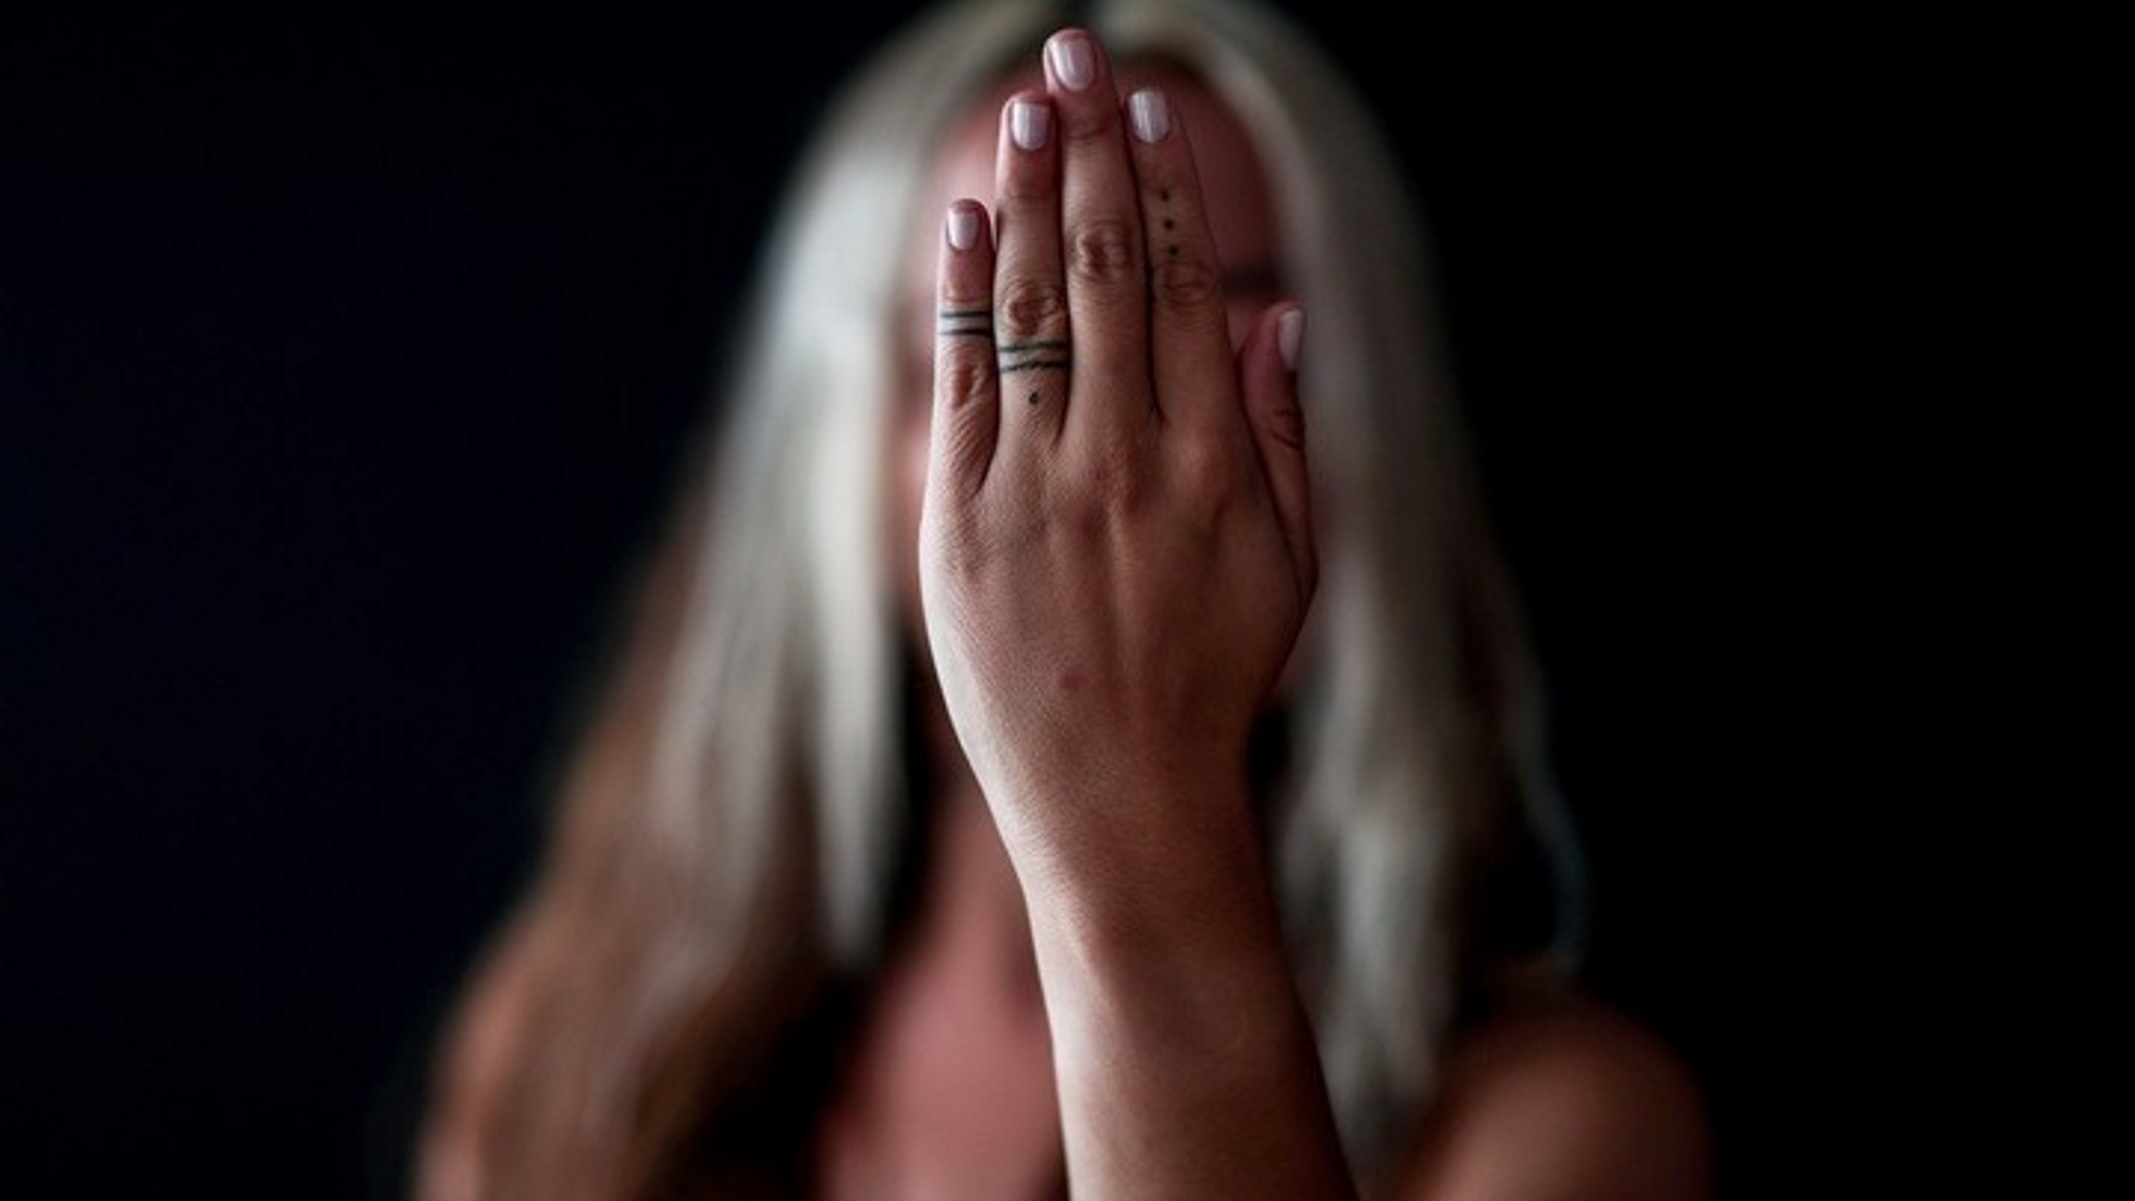 Hράκλειο: 19χρονη κατήγγειλε συγγενή του συζύγου για απόπειρα βιασμού της